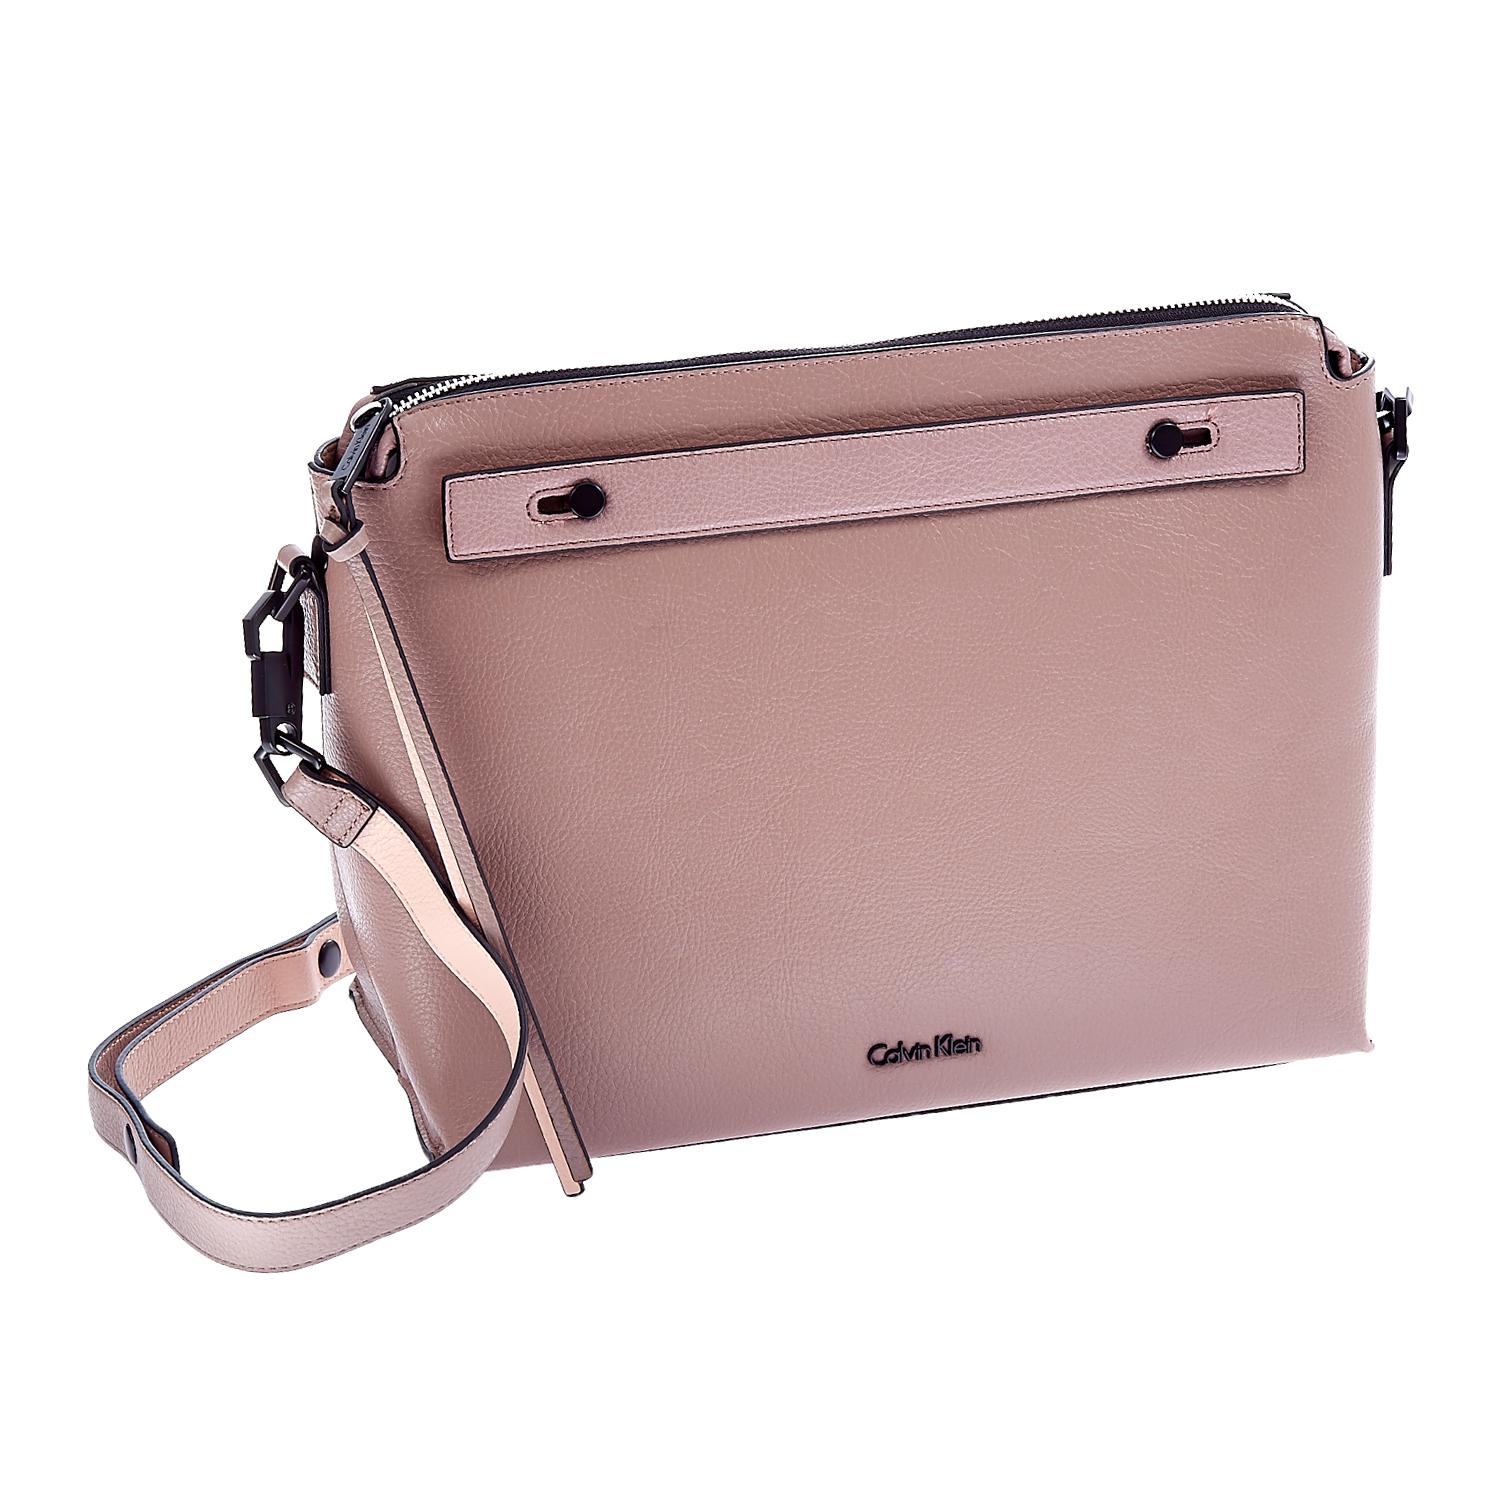 CALVIN KLEIN JEANS – Γυναικεία τσάντα Calvin Klein Jeans ροζ 1437110.0-00P3